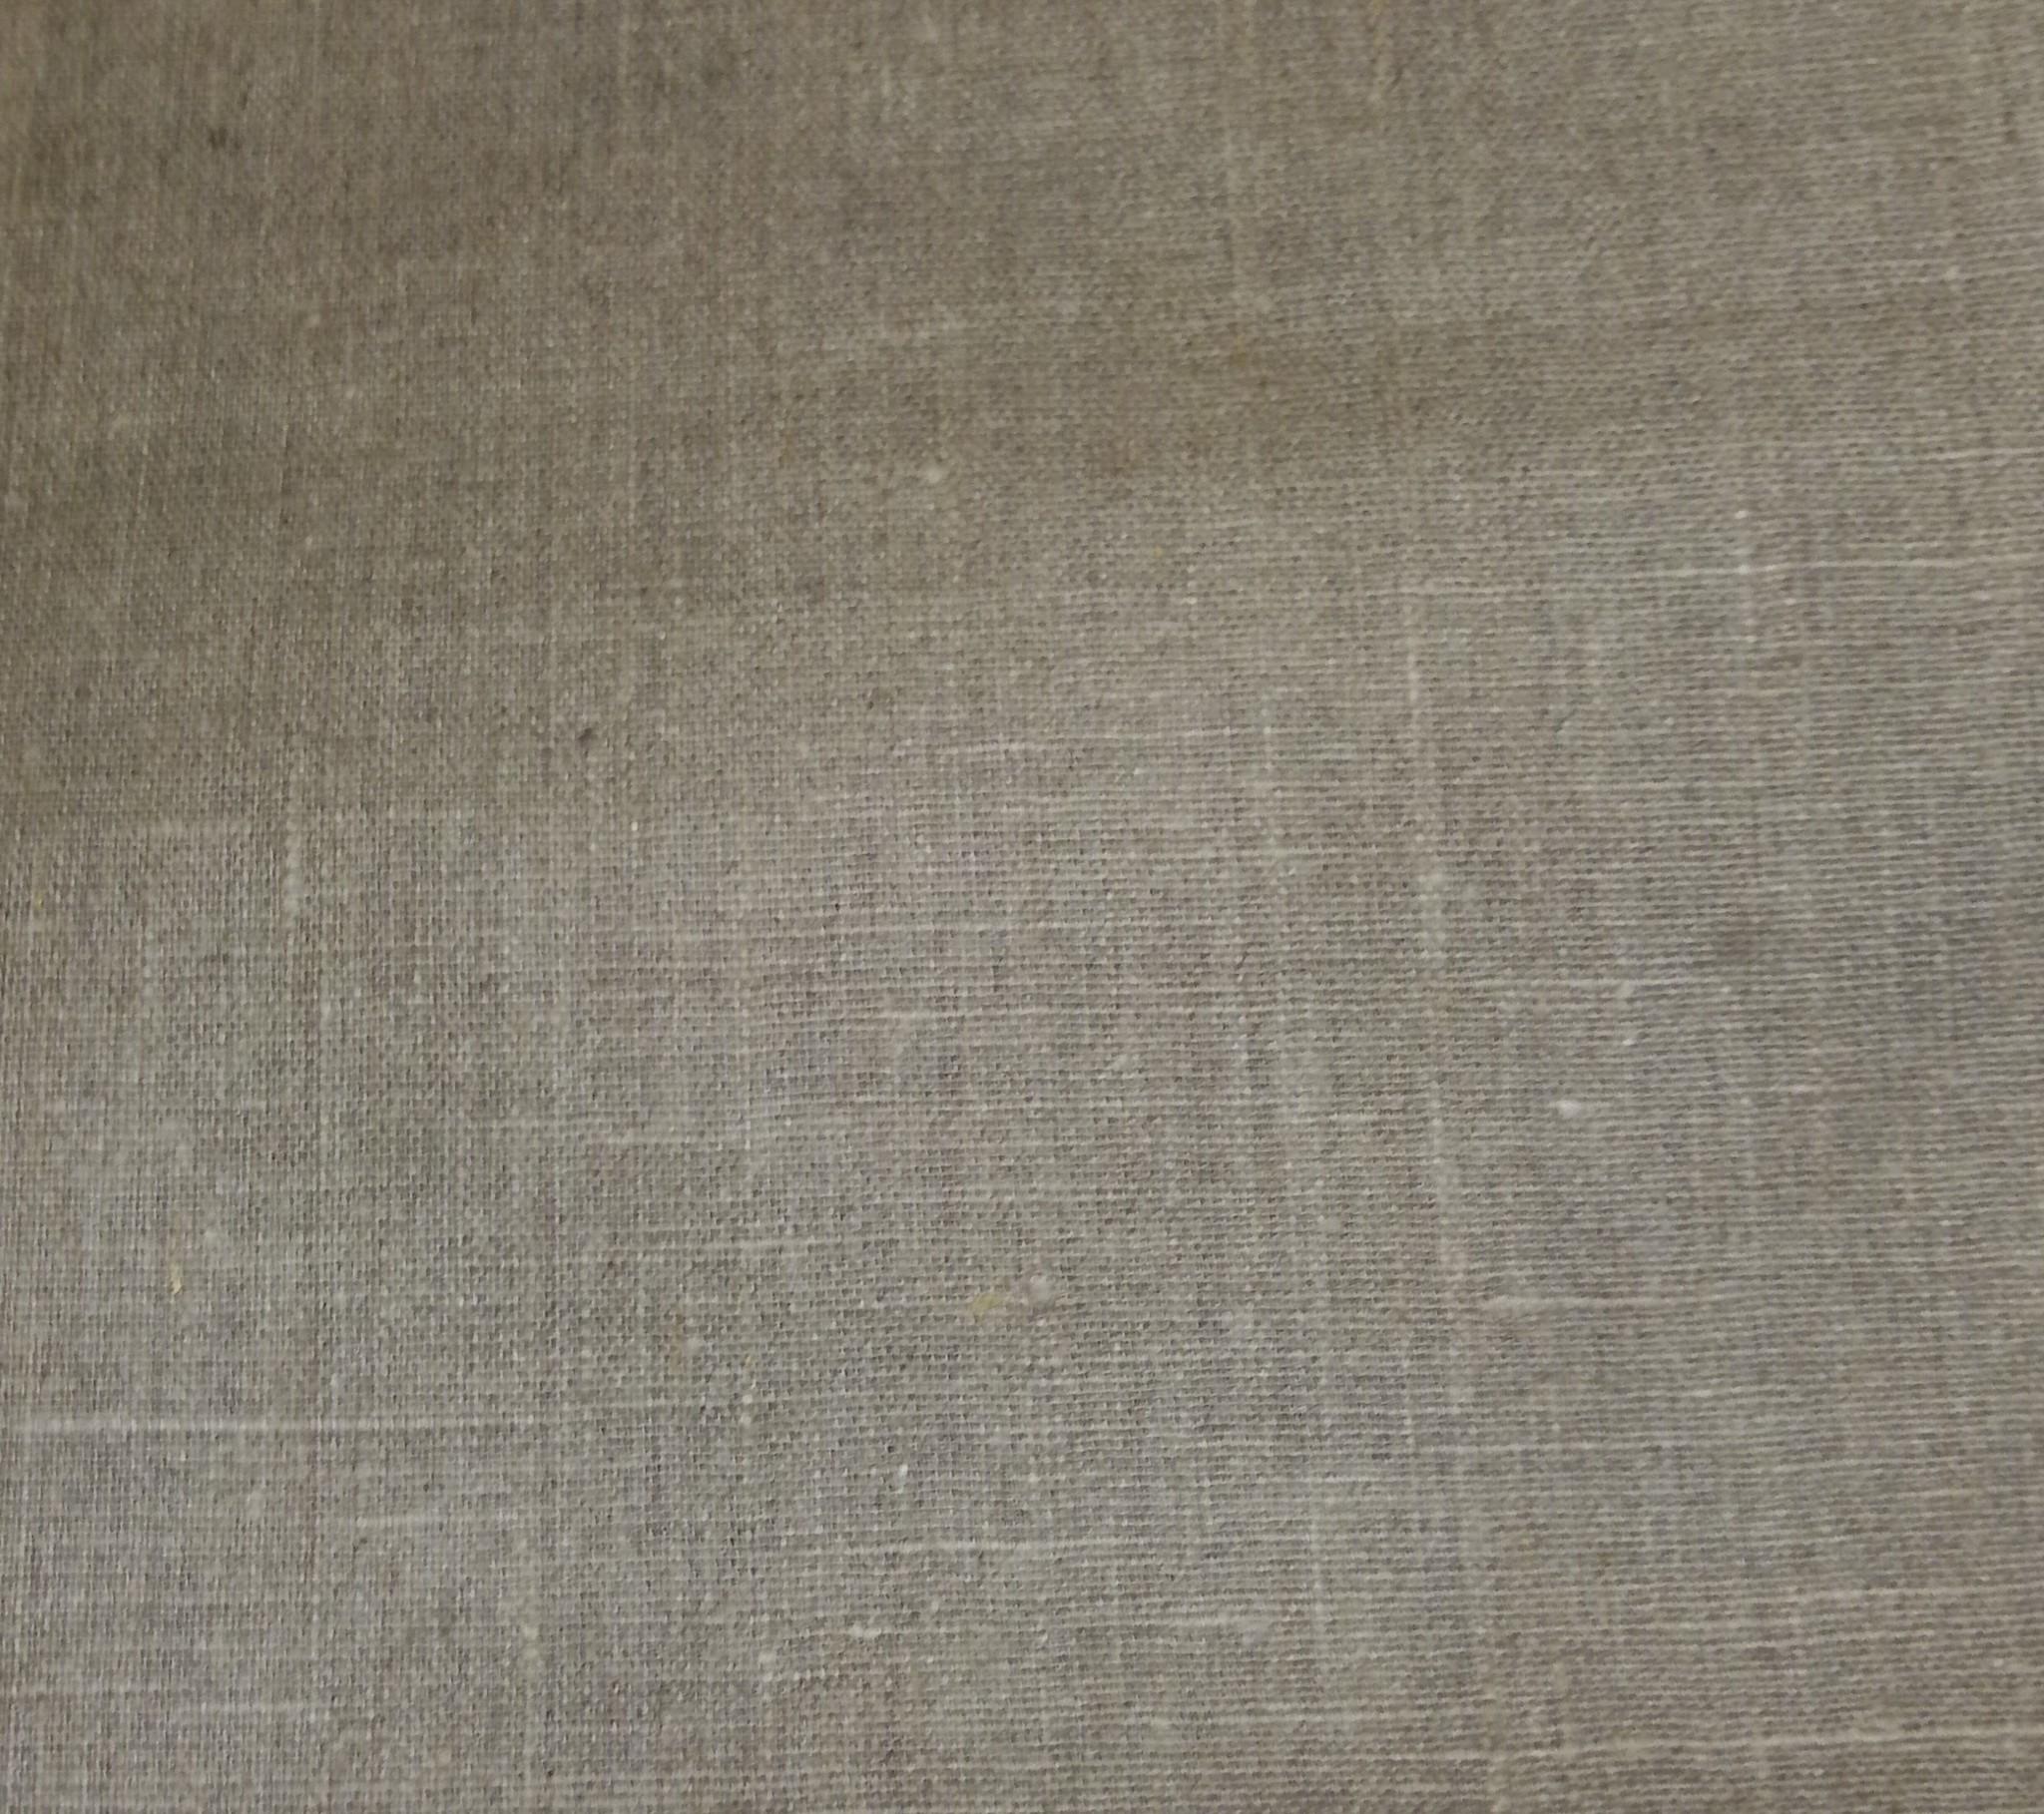 natural coated linen